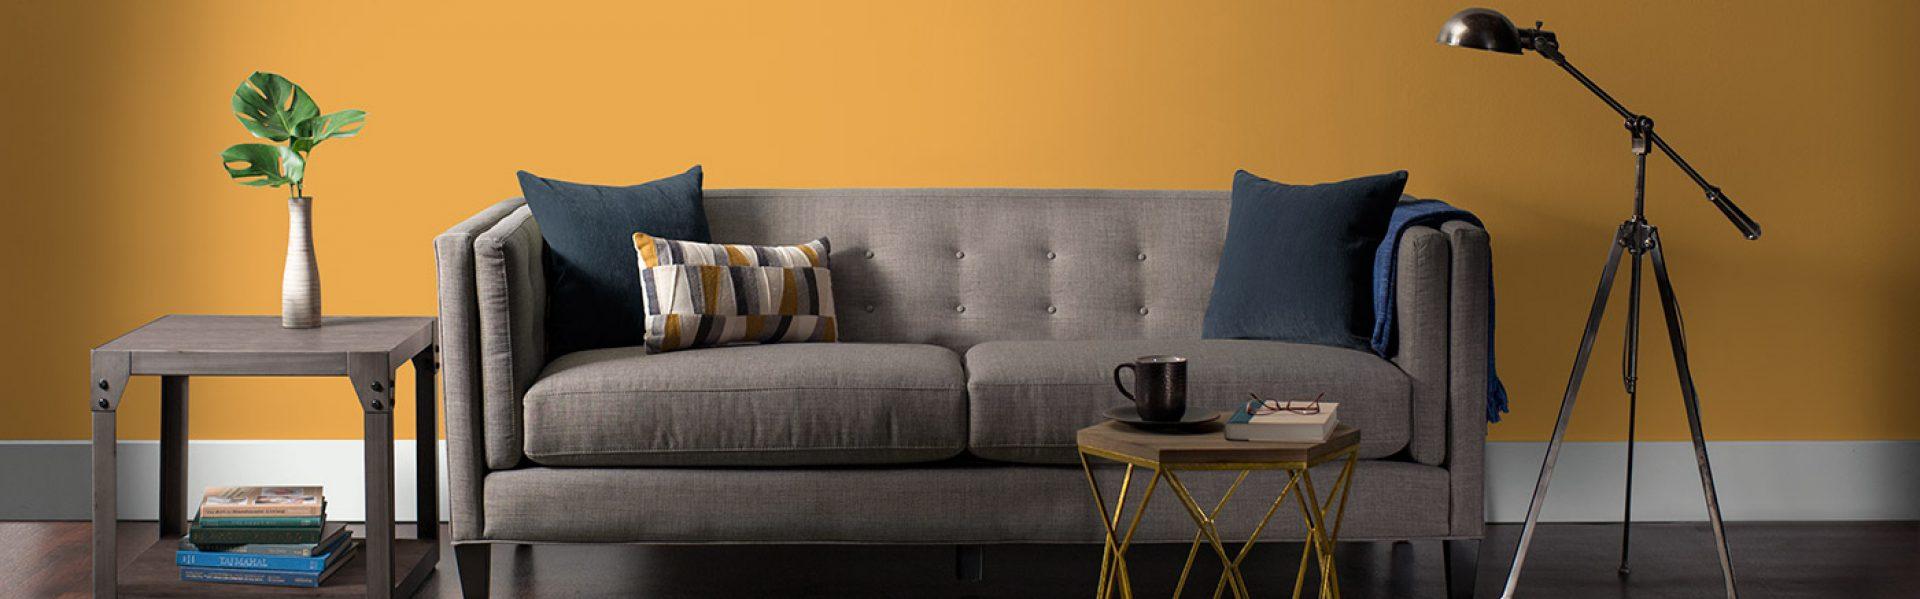 Décoration Huot & Hardy – Benjamin Moore paint store, ROSEMERE, QC, J7A 2H3